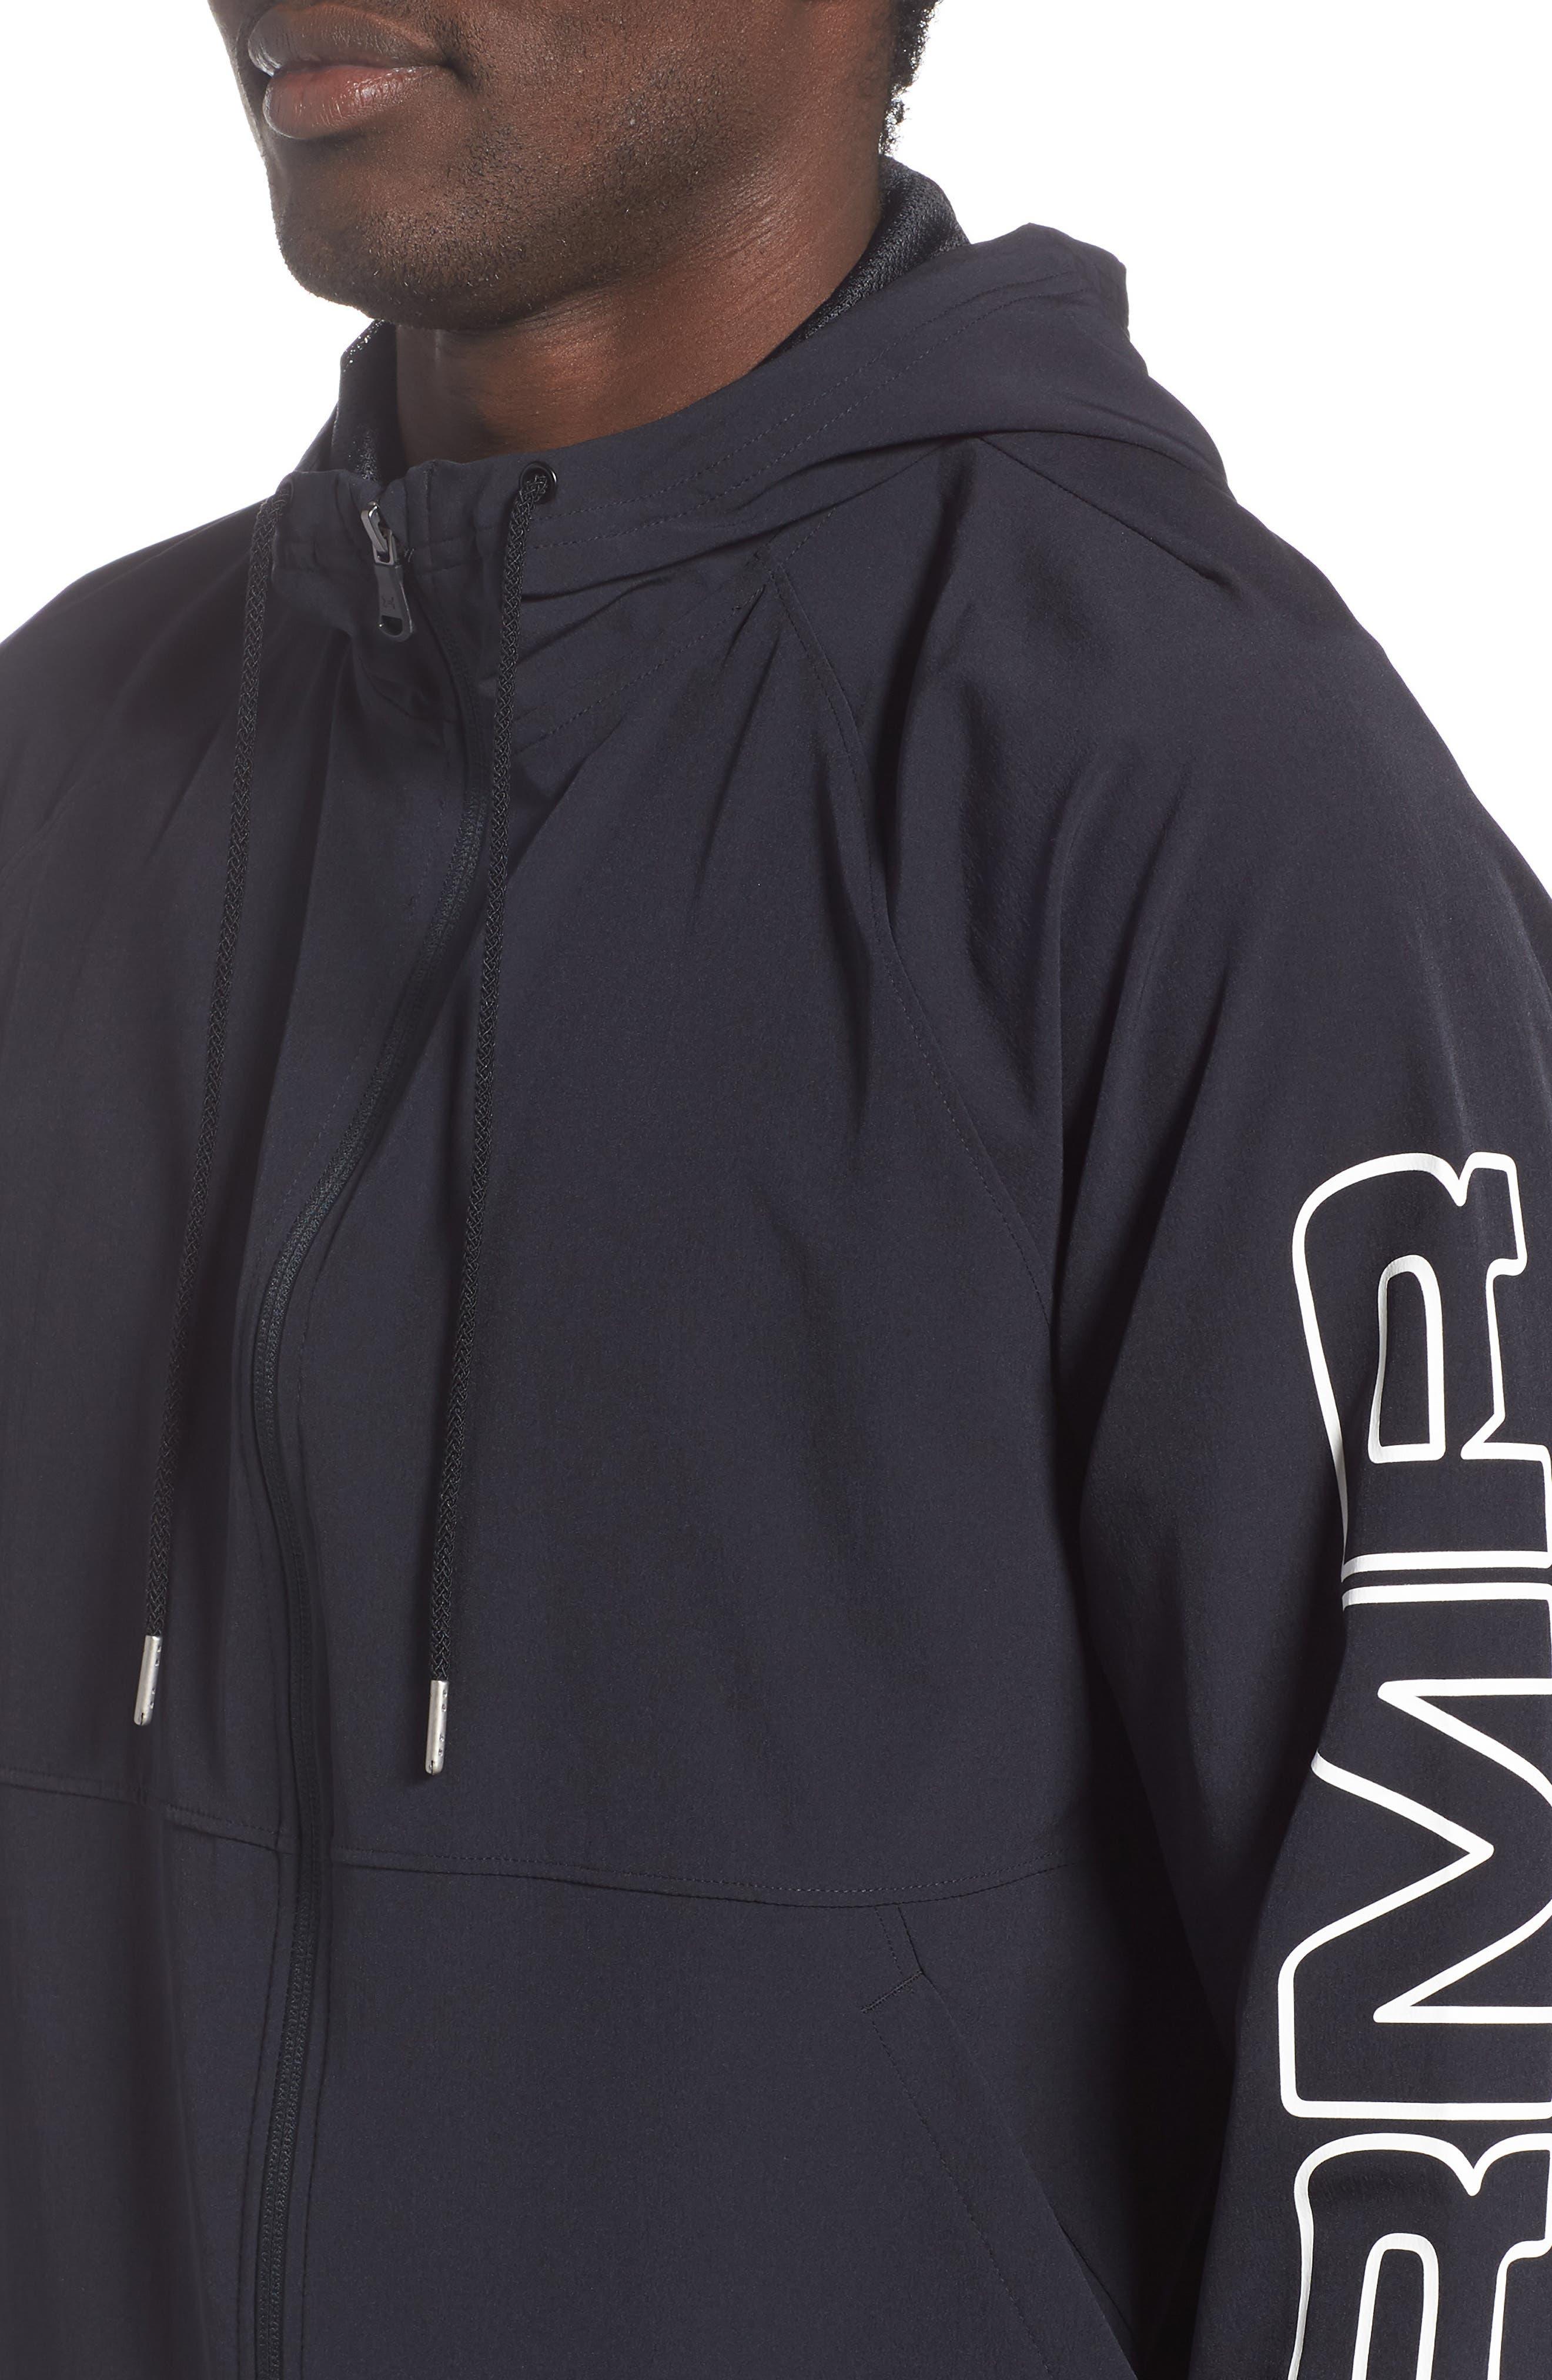 Baseline Hooded Jacket,                             Alternate thumbnail 4, color,                             BLACK